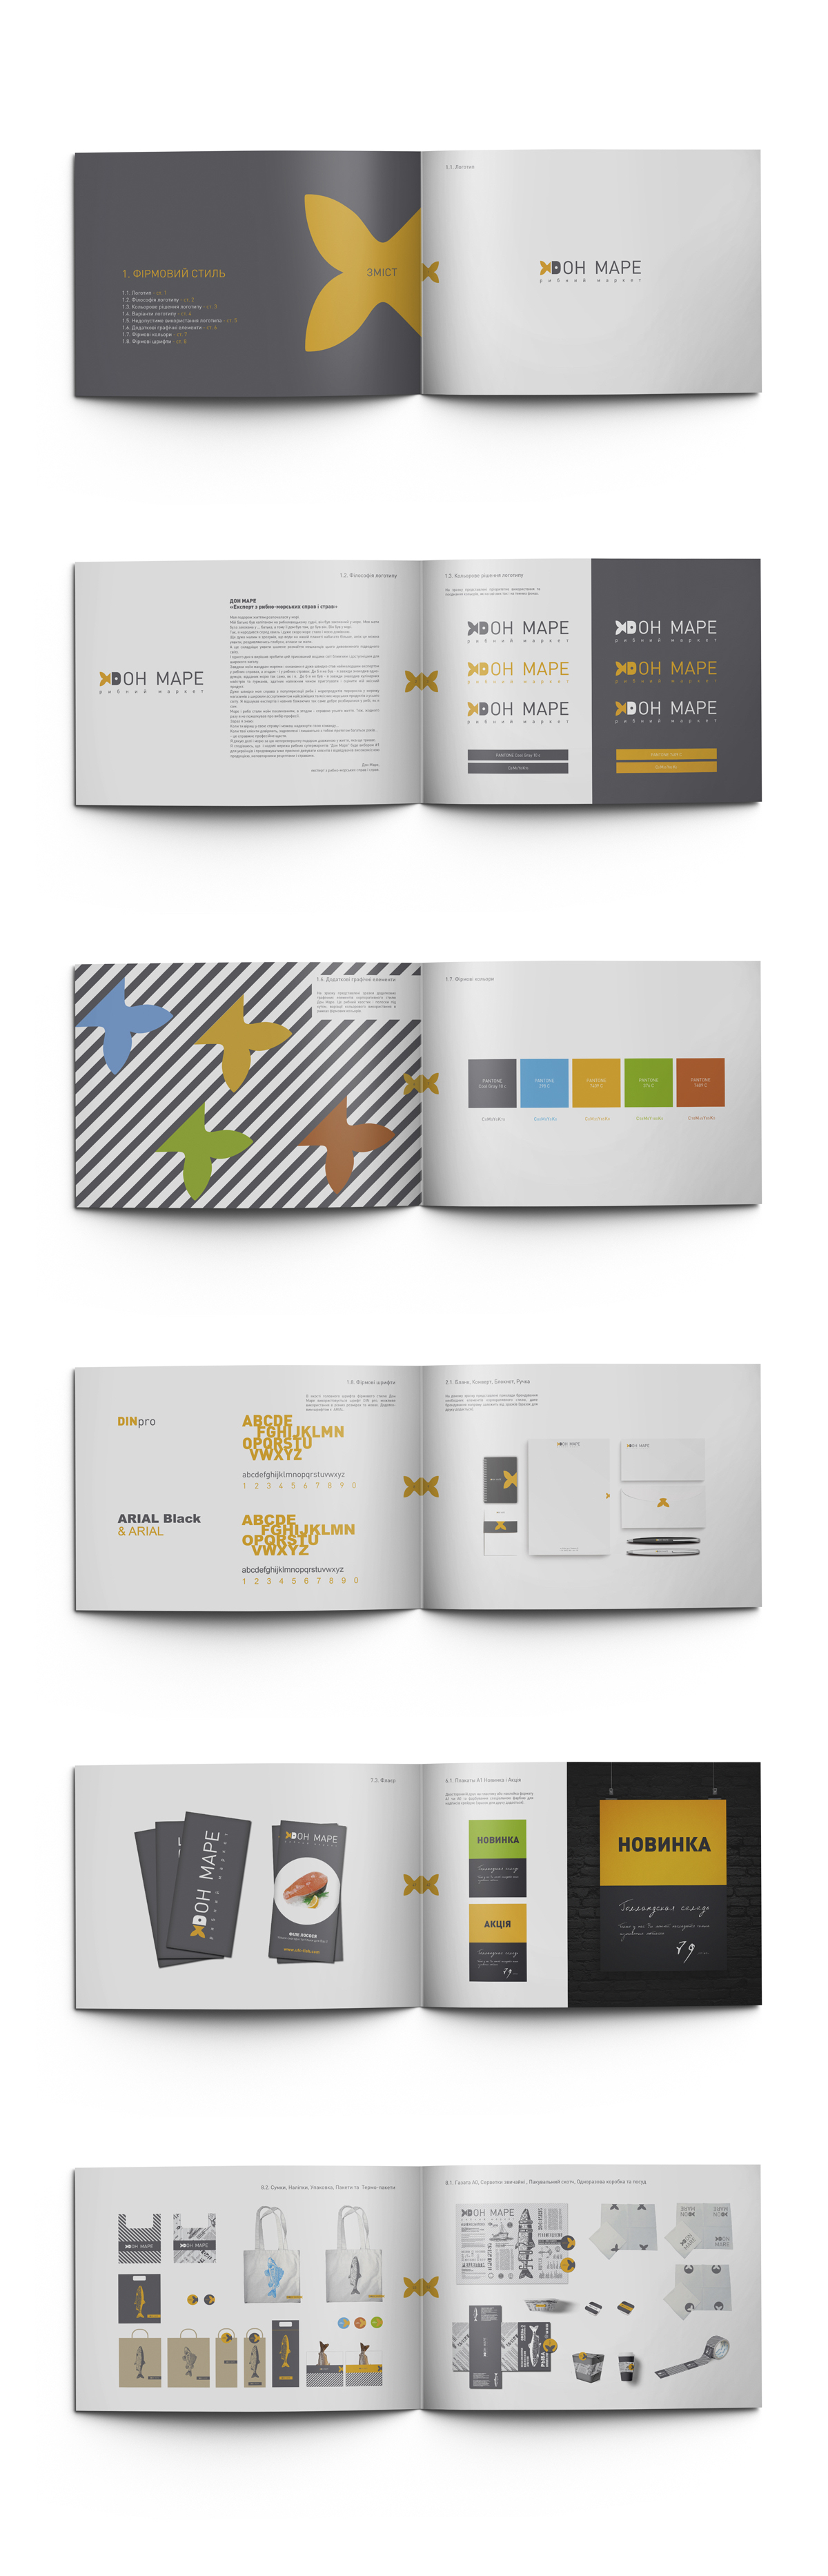 Don Mare Brandbook-2